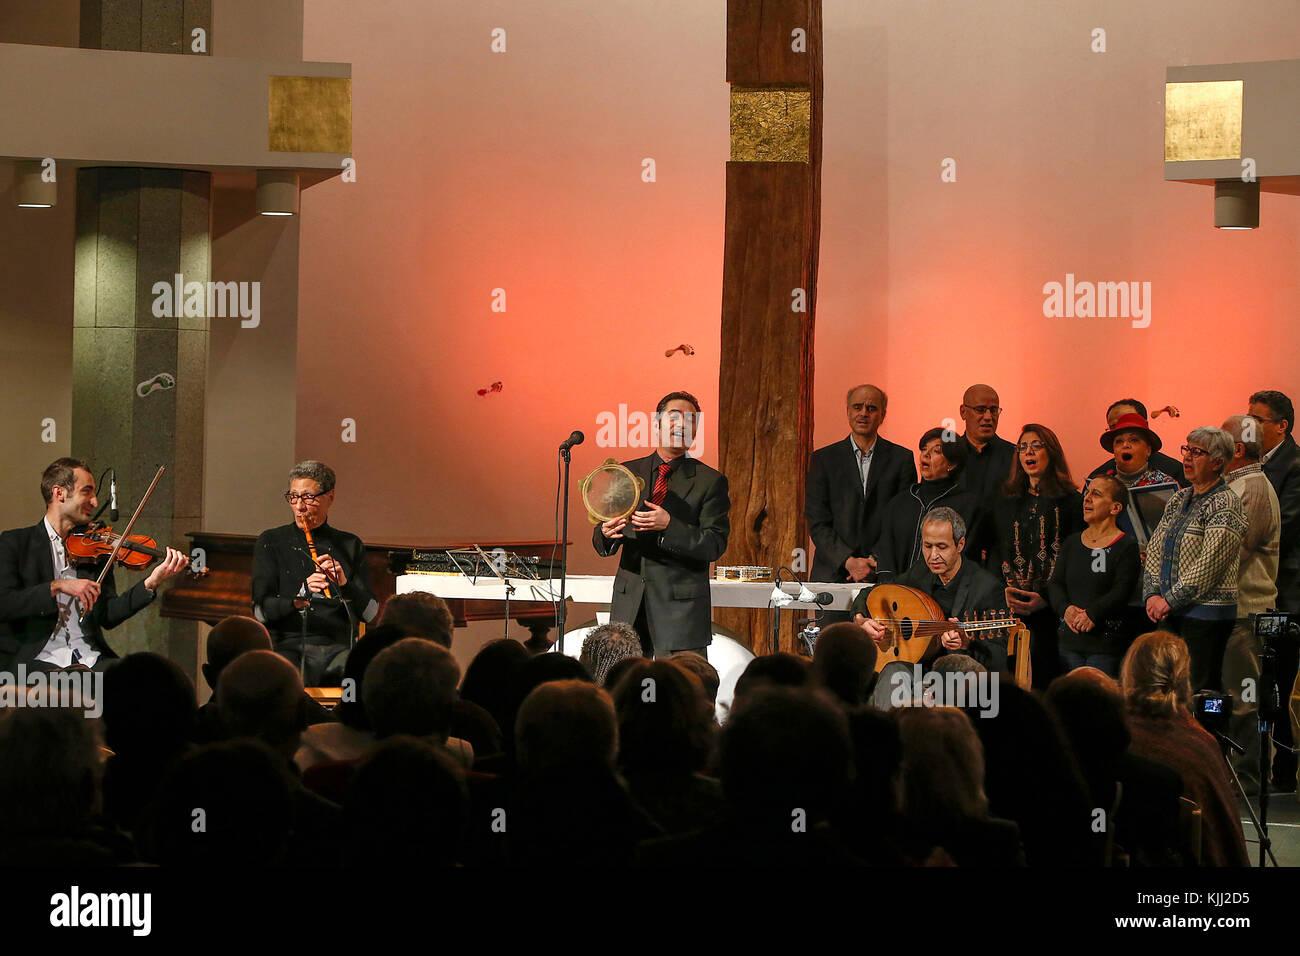 Singer Hamam Khairi & the Wajd ensemble in Notre Dame d'Esperance church, Paris. France. - Stock Image